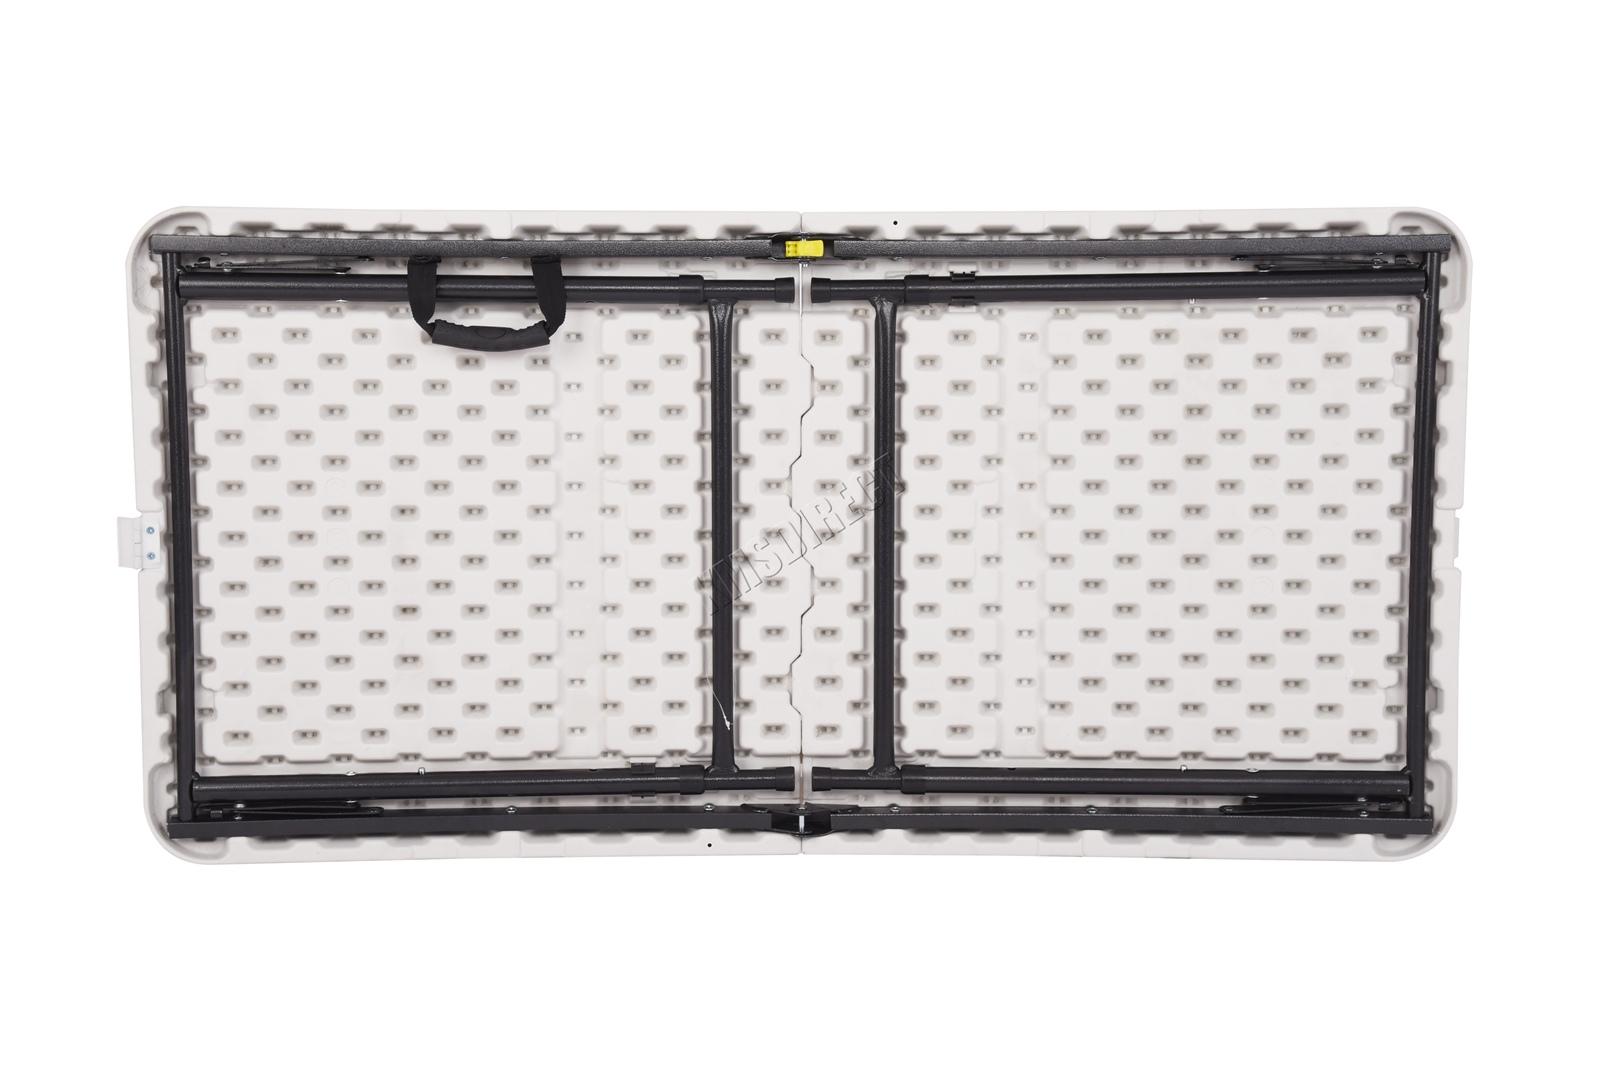 Westwood Portable Folding Trestle Table Heavy Duty Plastic